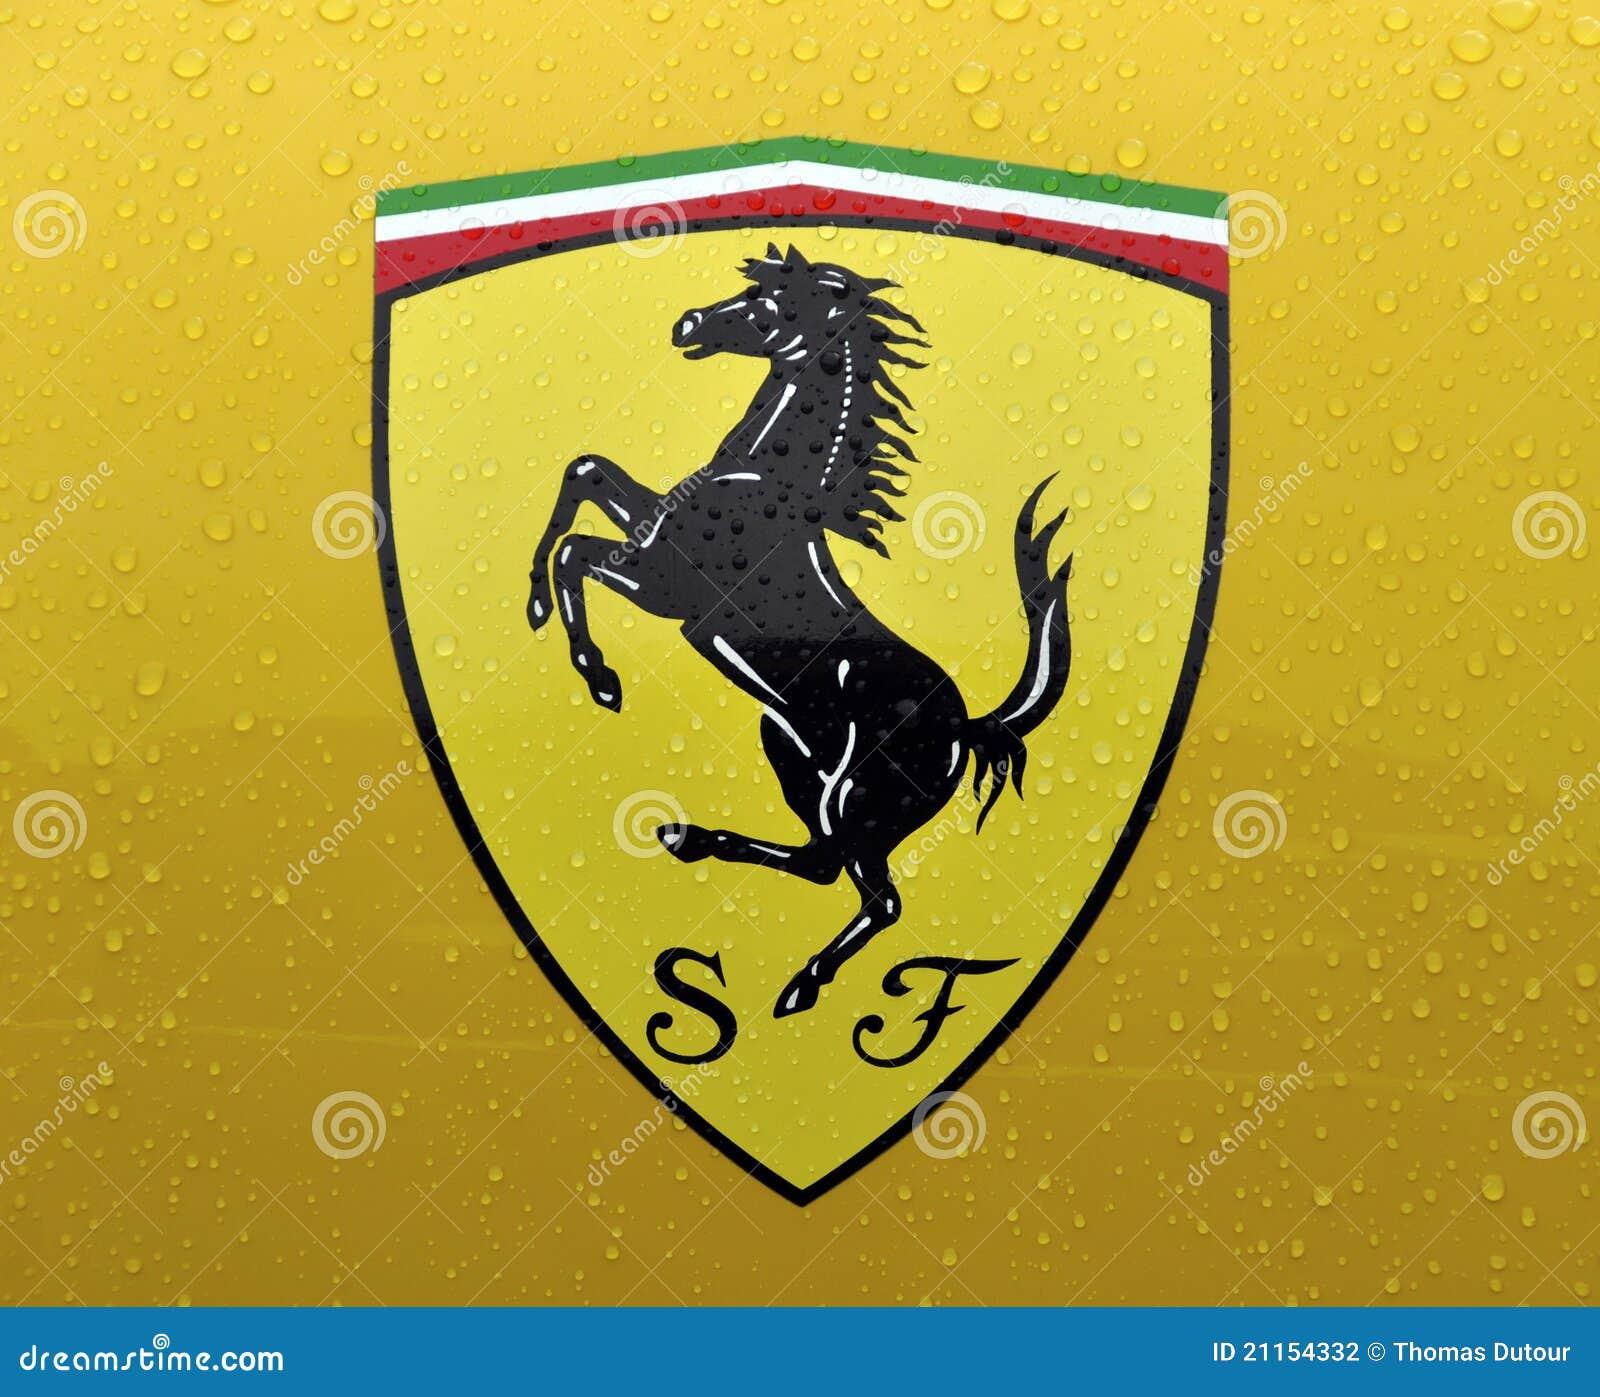 The Cavallino Rampante Symbol Of Ferrari Editorial Photography